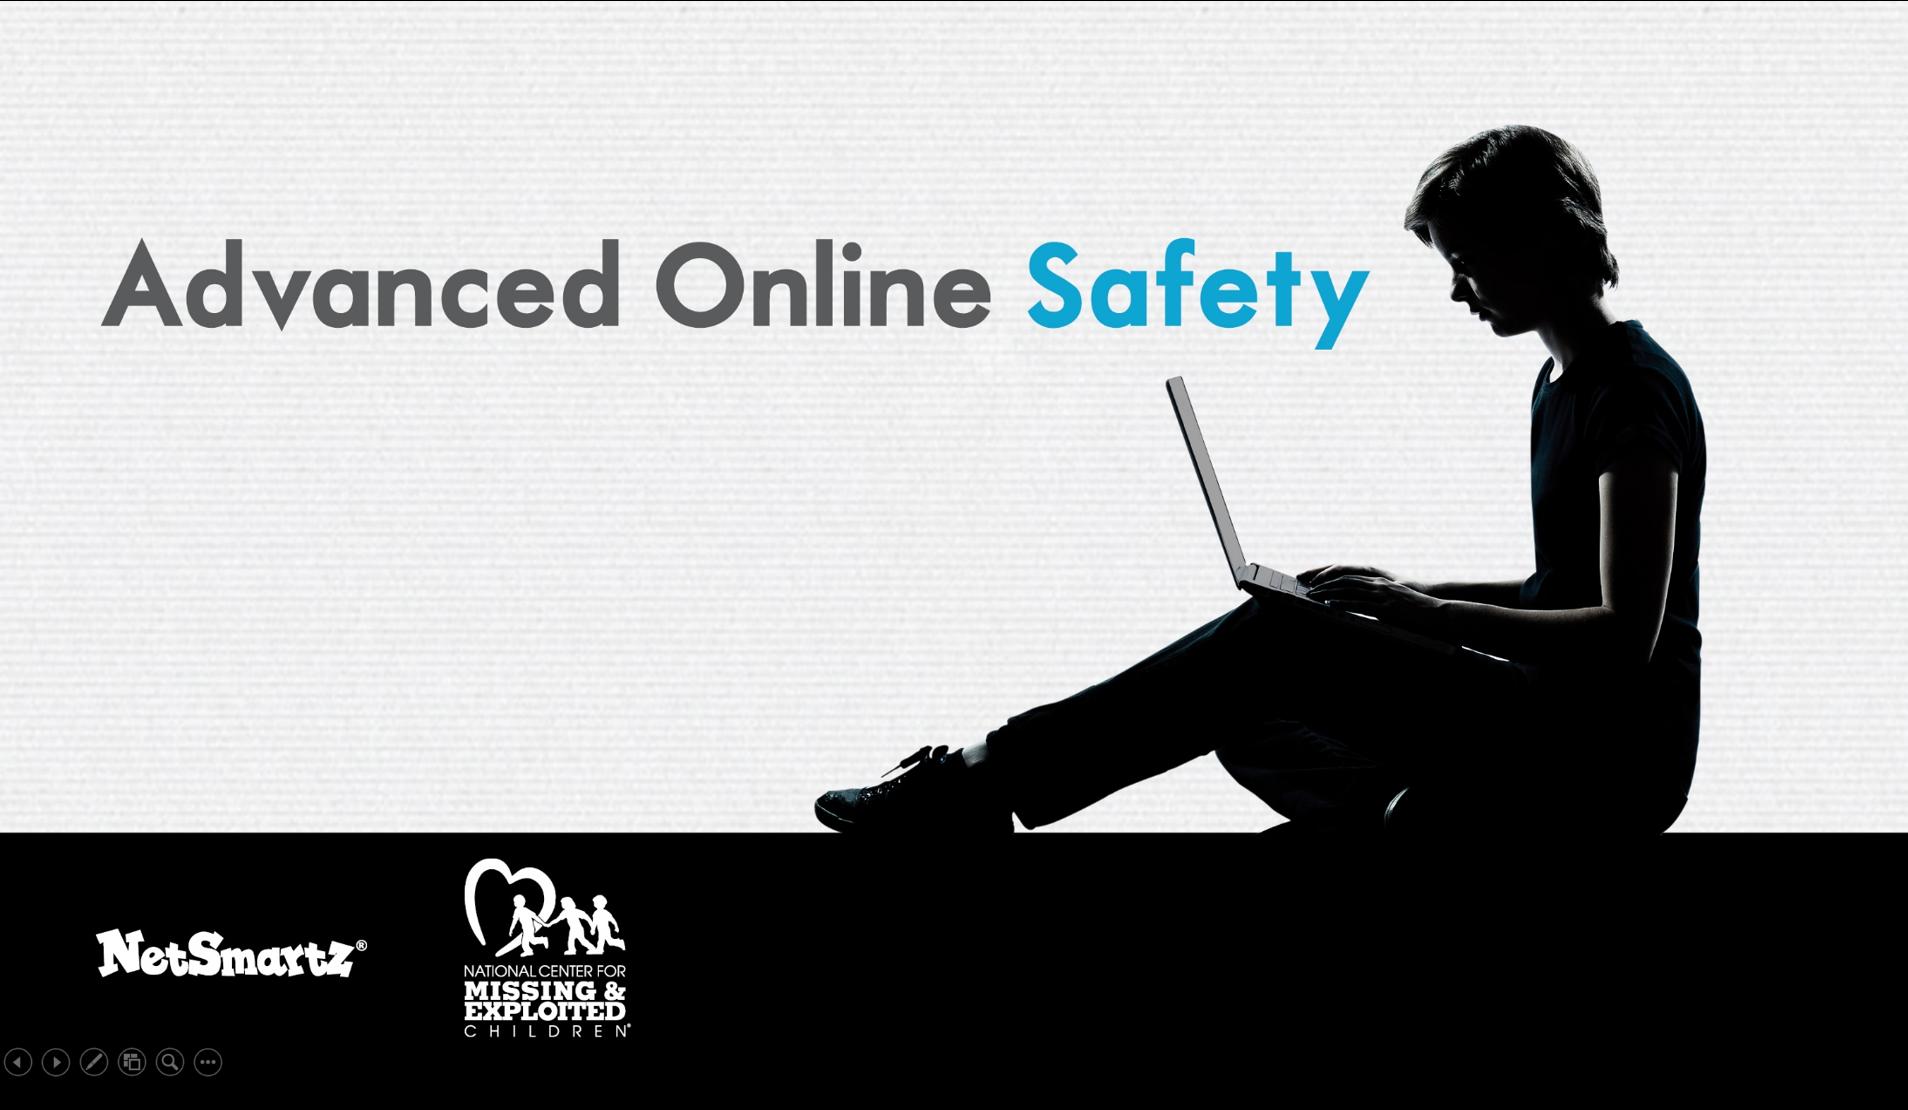 Advanced Online Safety